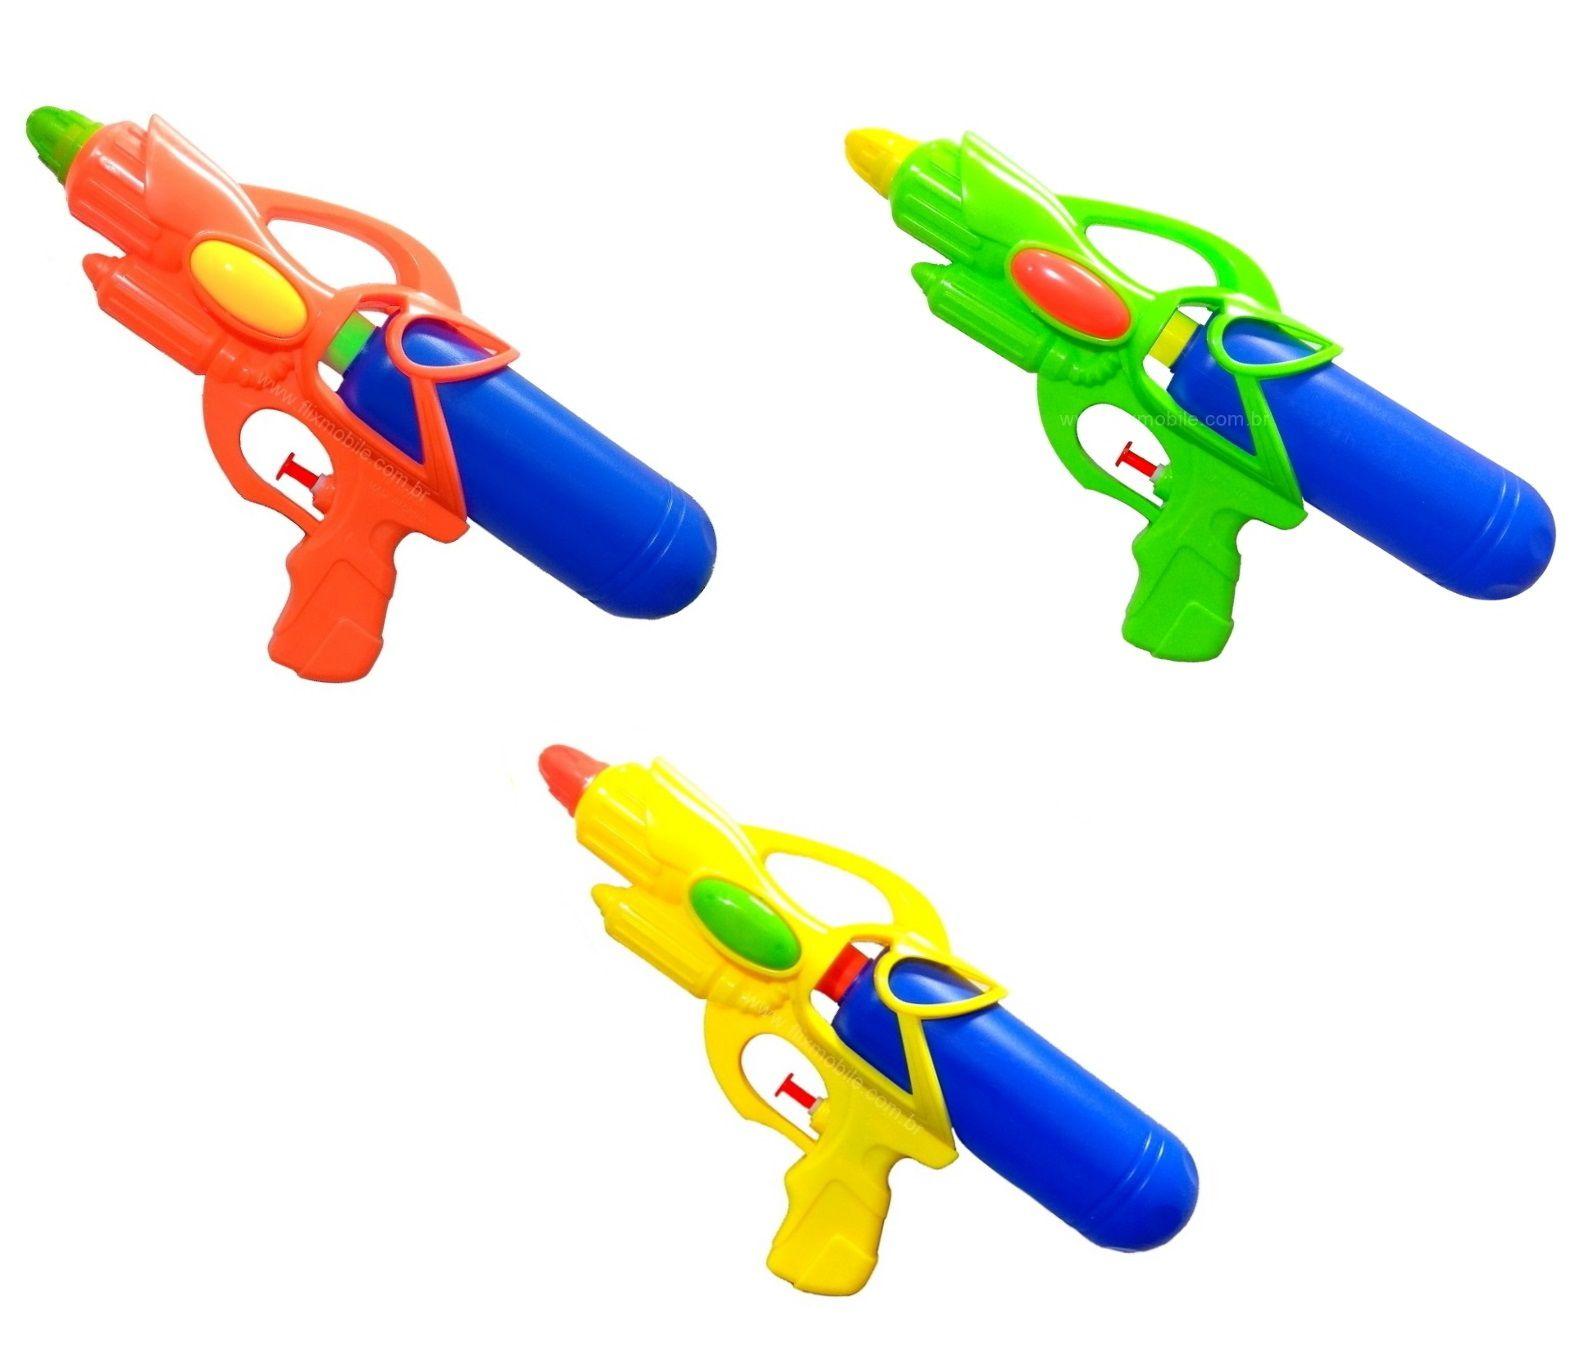 Kit C/2 Super Lançador De Água Flix Water Pistola De Agua